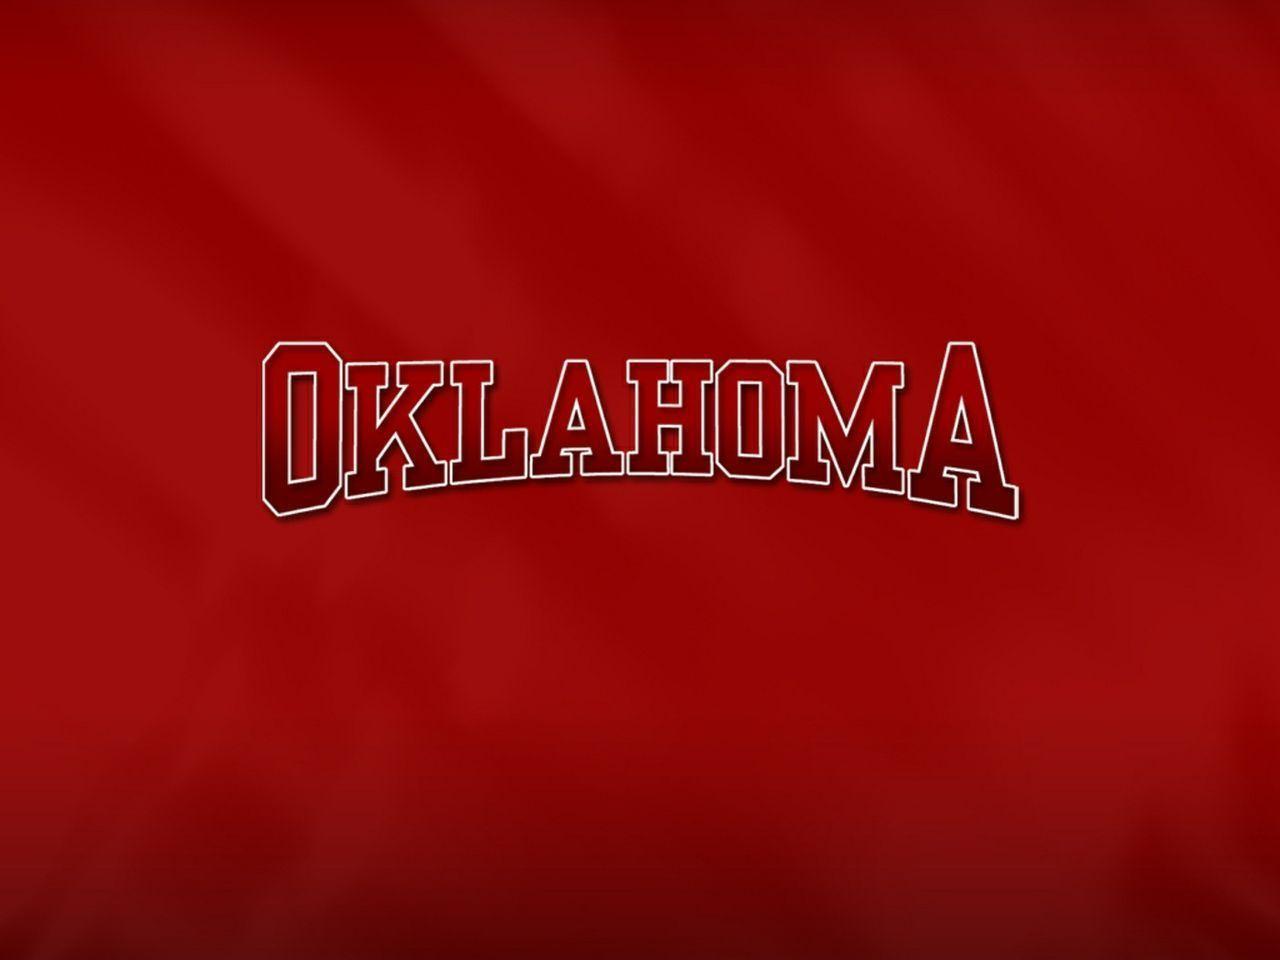 Oklahoma Sooner Wallpapers 1280x960